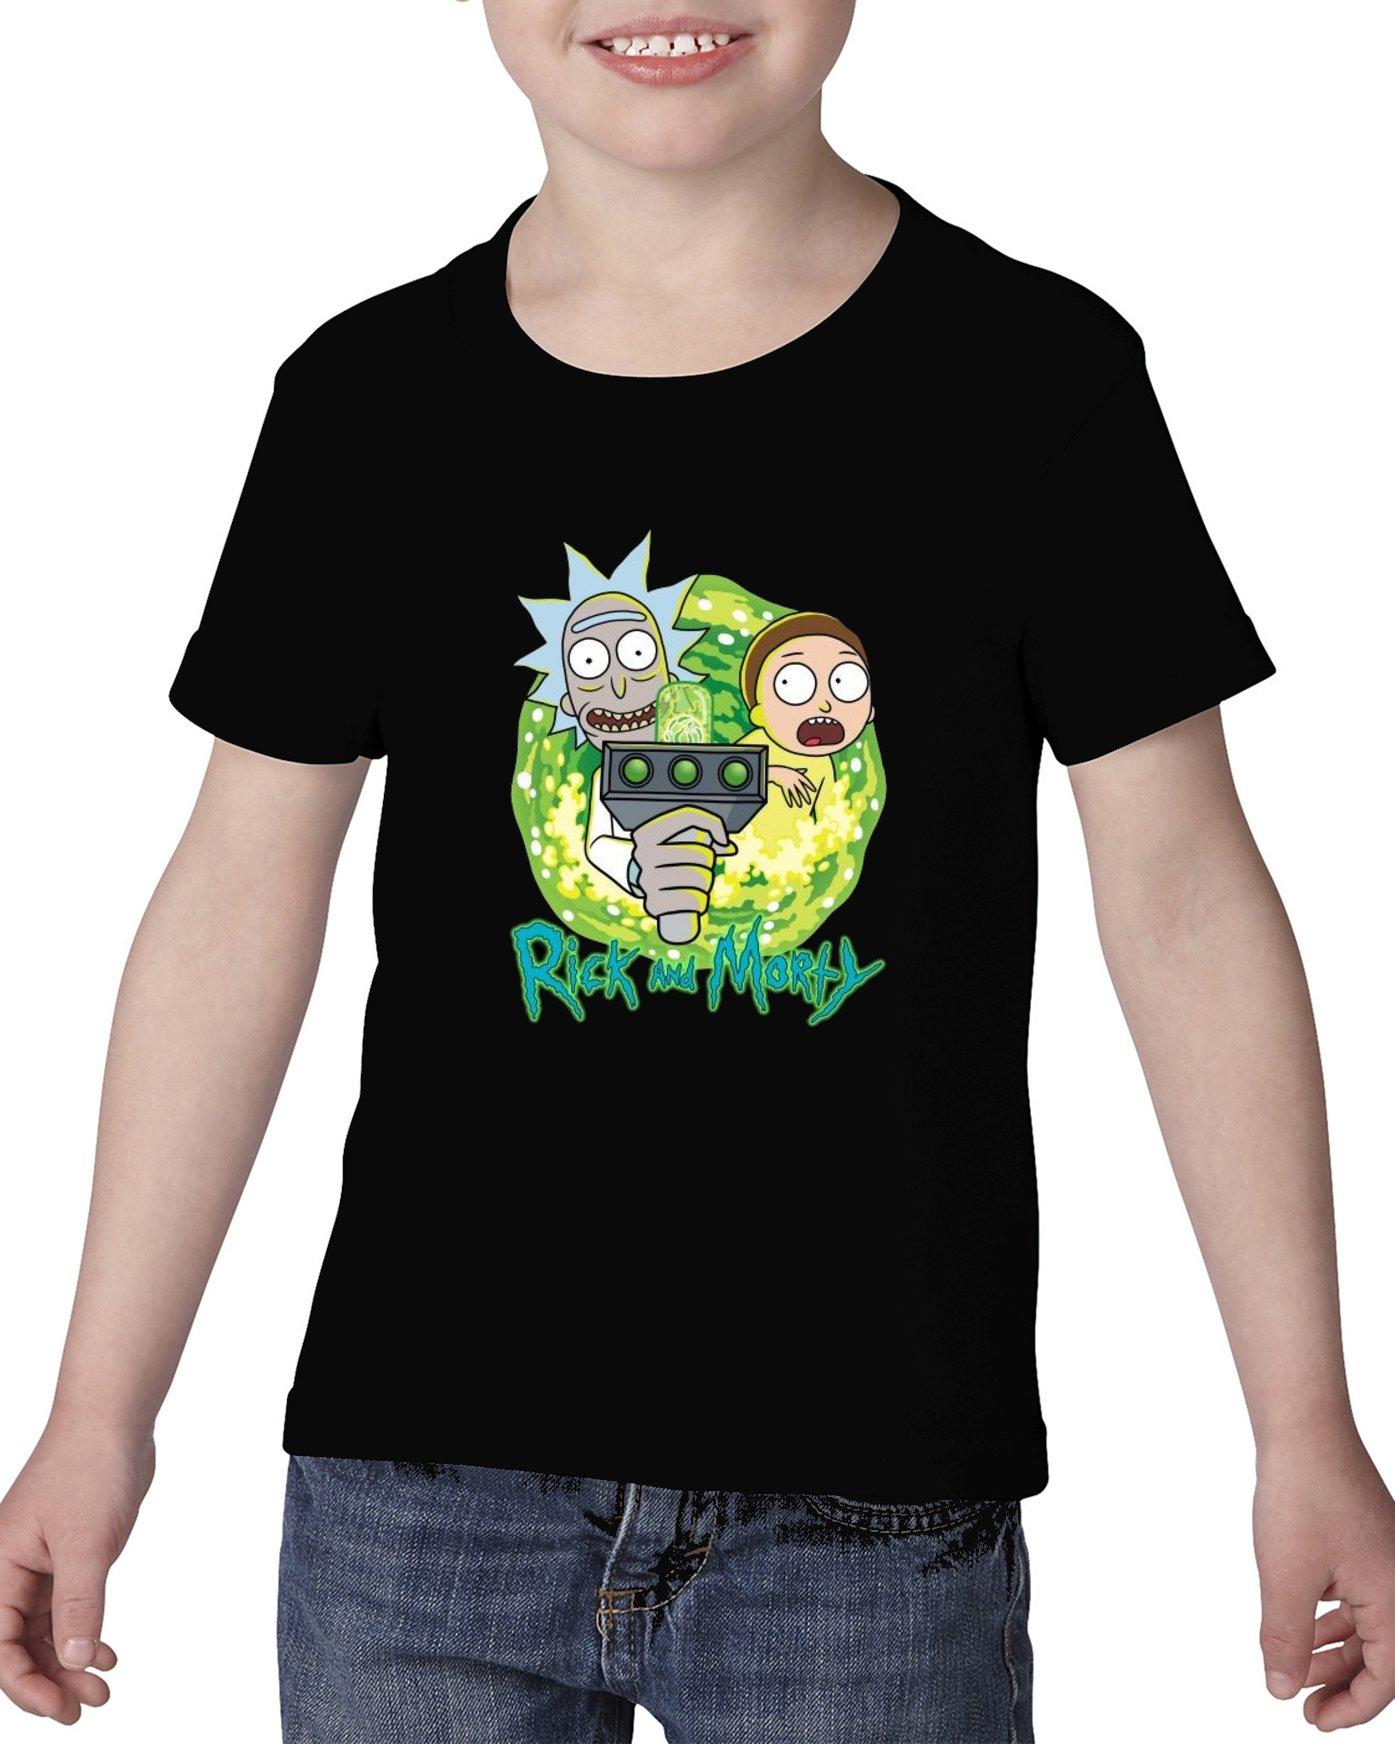 camiseta rick morty negra.jpg